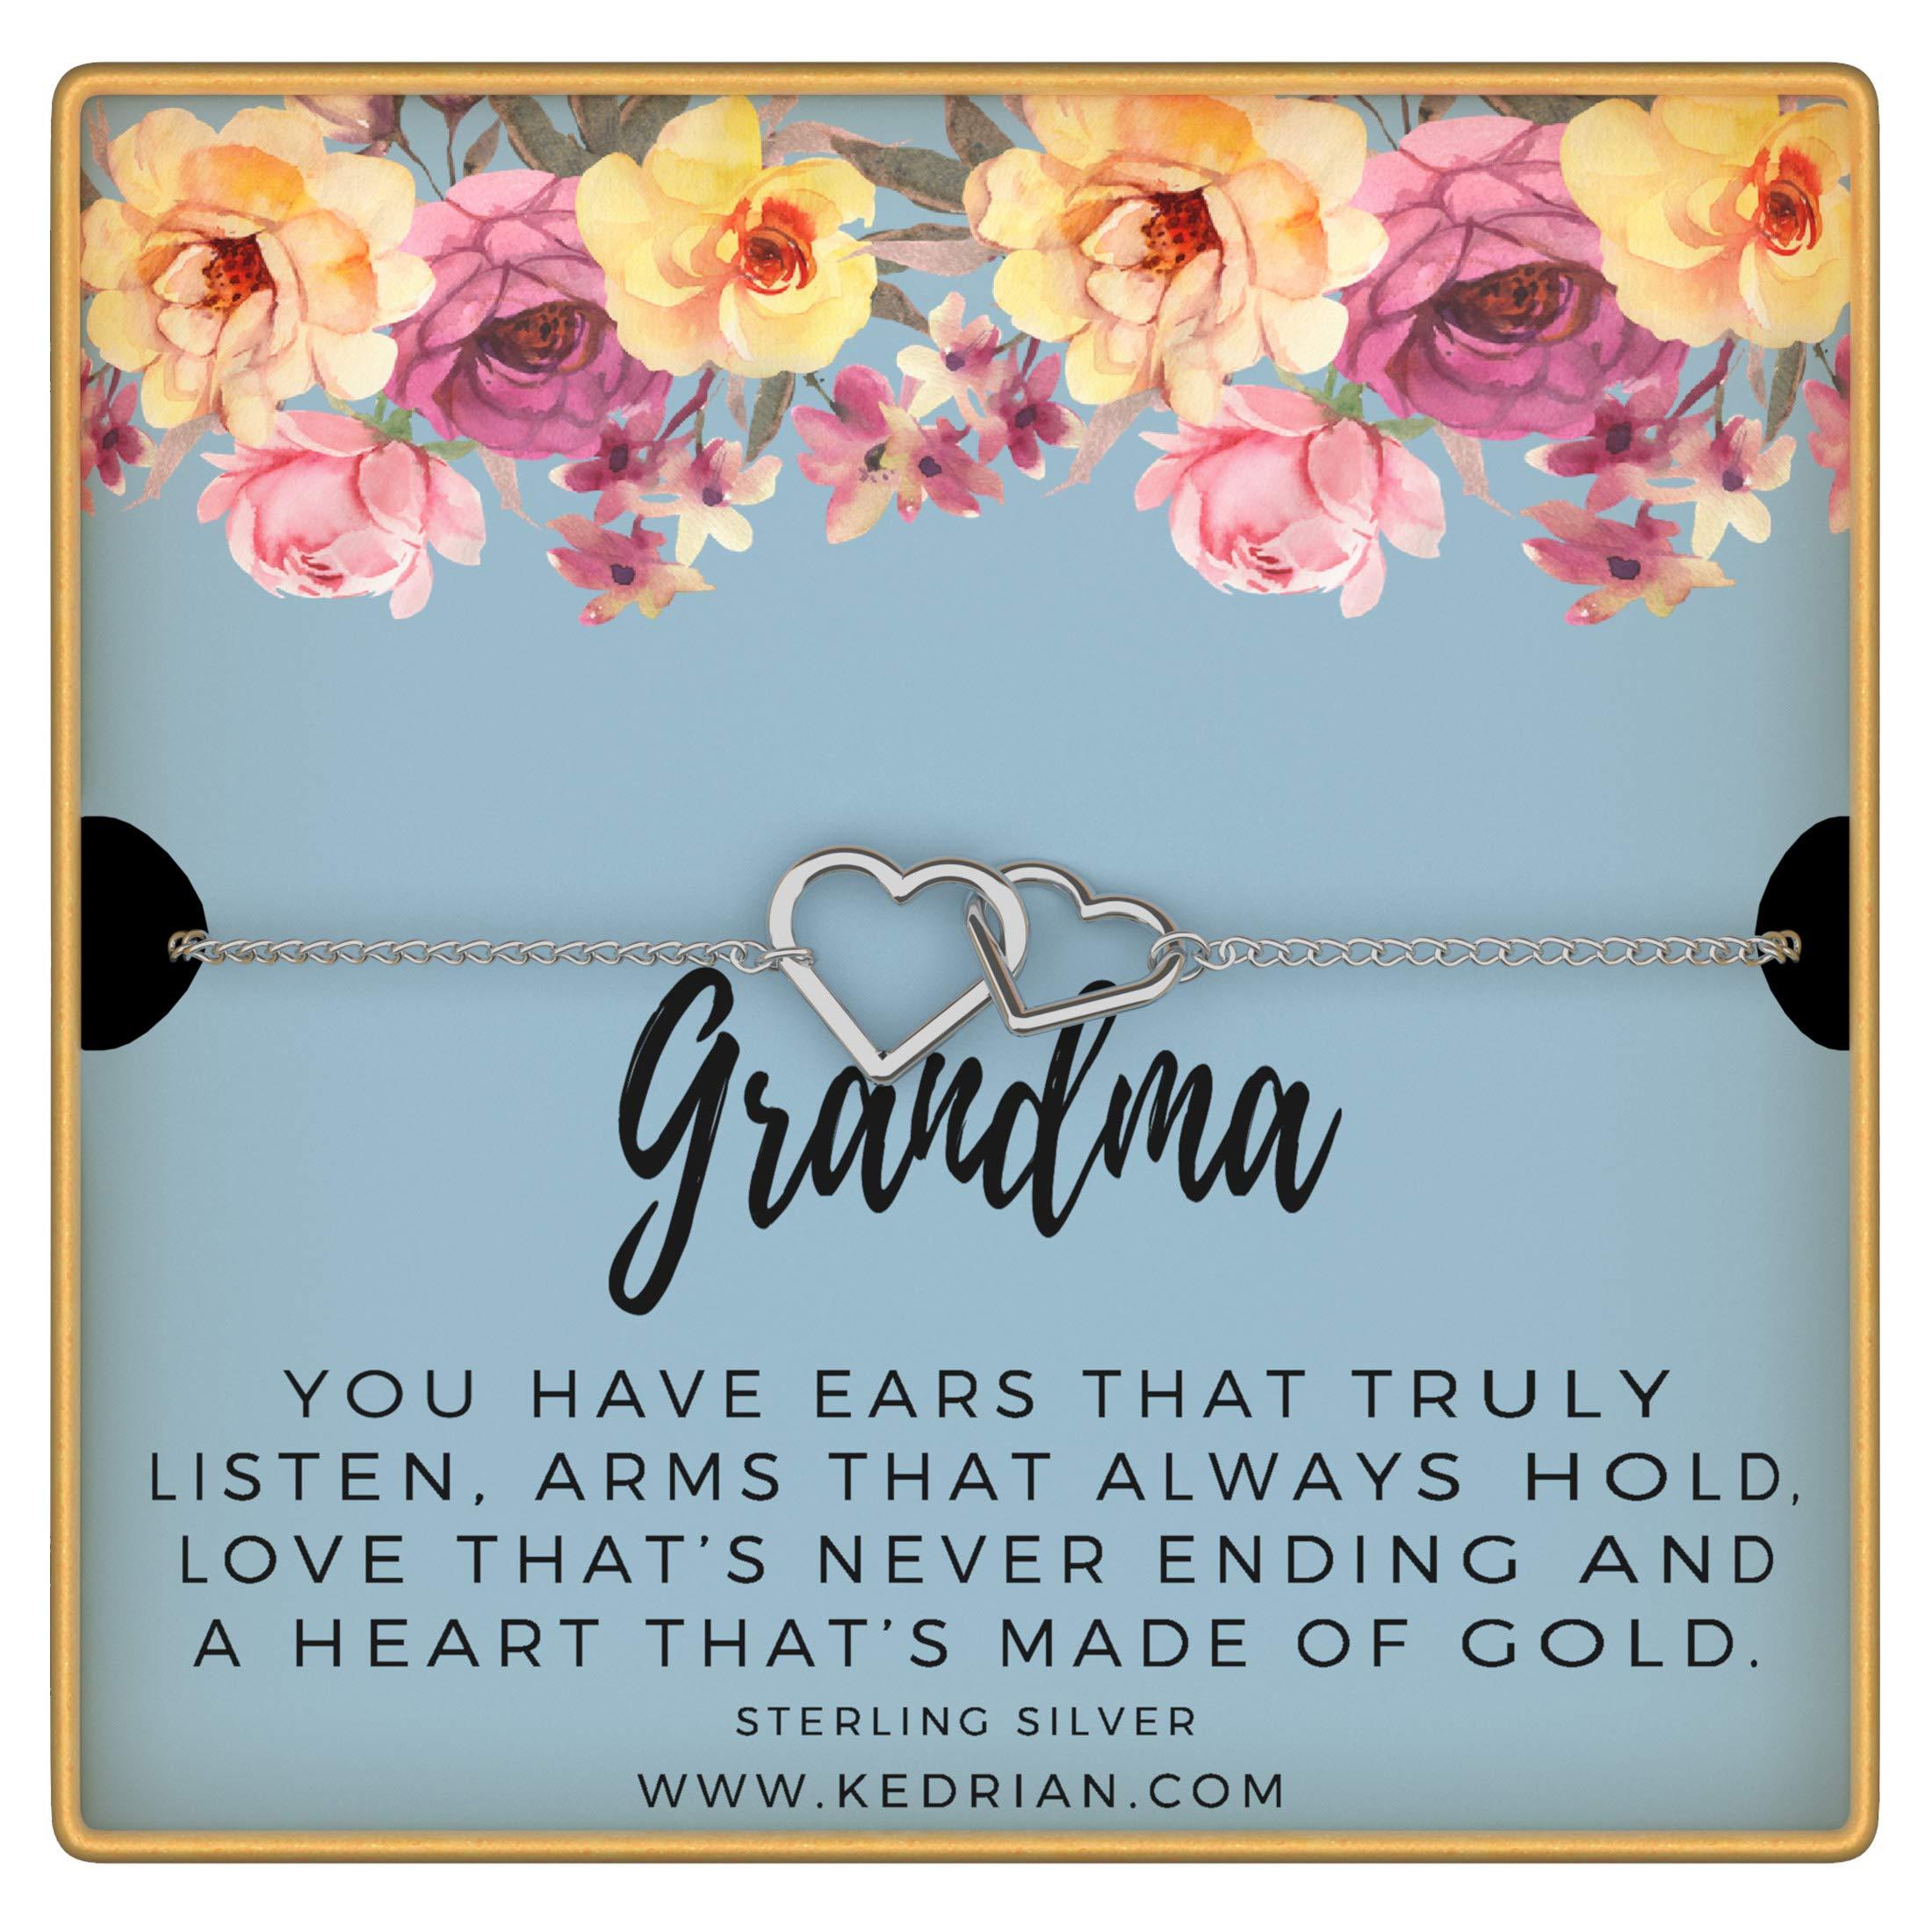 KEDRIAN Grandma Bracelet, 925 Sterling Silver, Best Grandma Gifts For Women, Gifts For Grandma, New Grandma Gifts, Gift For Grandma, Grandma Birthday Gift Bracelet, Mother's Day Gifts For Nana by KEDRIAN